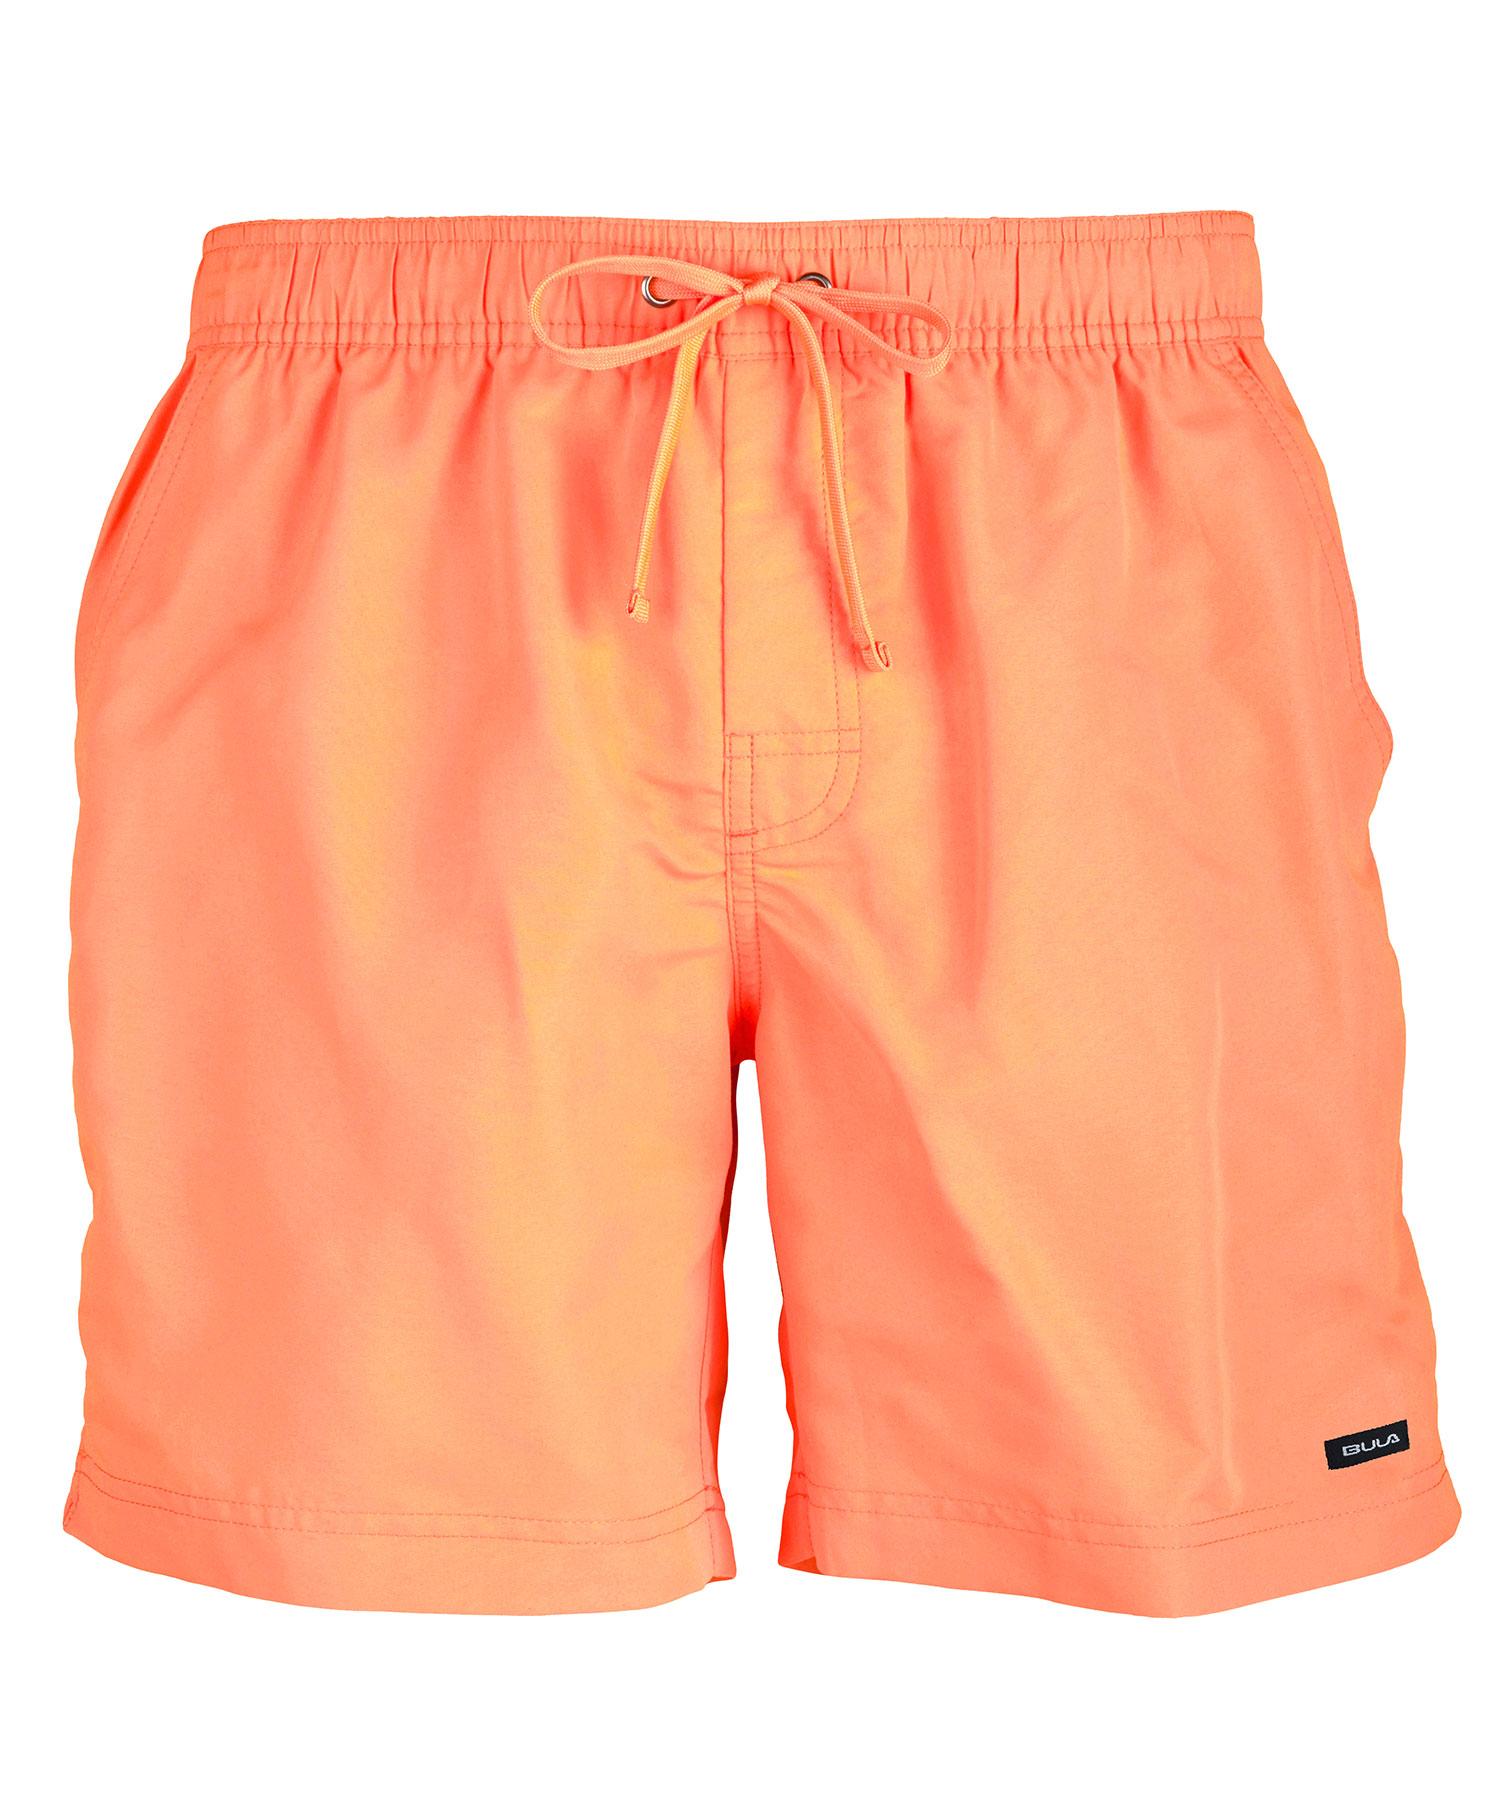 Bula Hang Five shorts